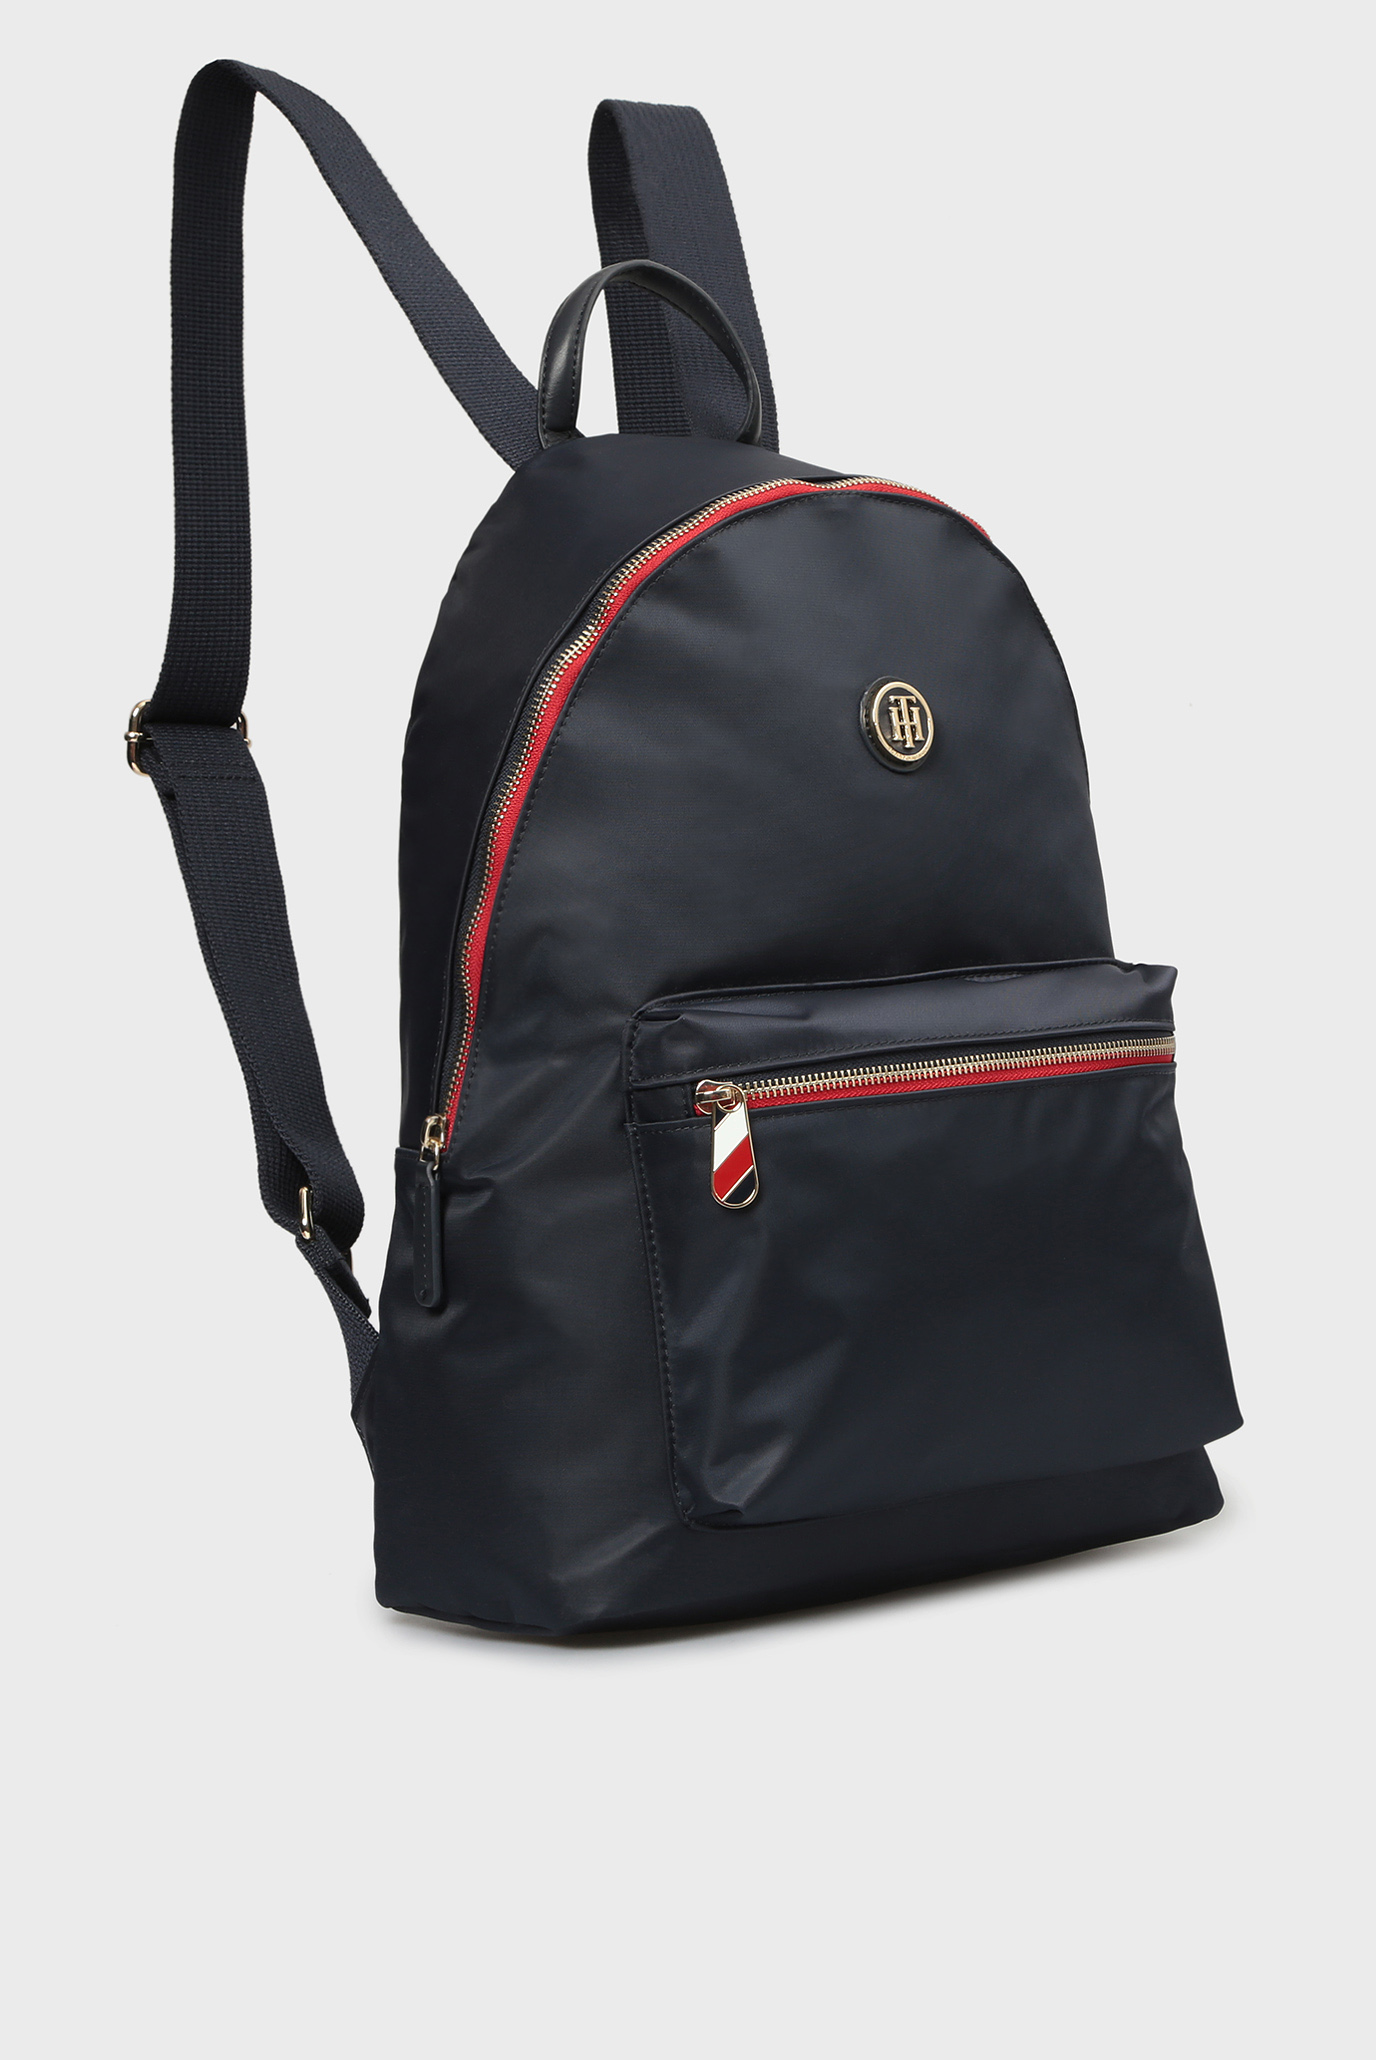 Купить Женский синий рюкзак POPPY Tommy Hilfiger Tommy Hilfiger AW0AW05660 – Киев, Украина. Цены в интернет магазине MD Fashion